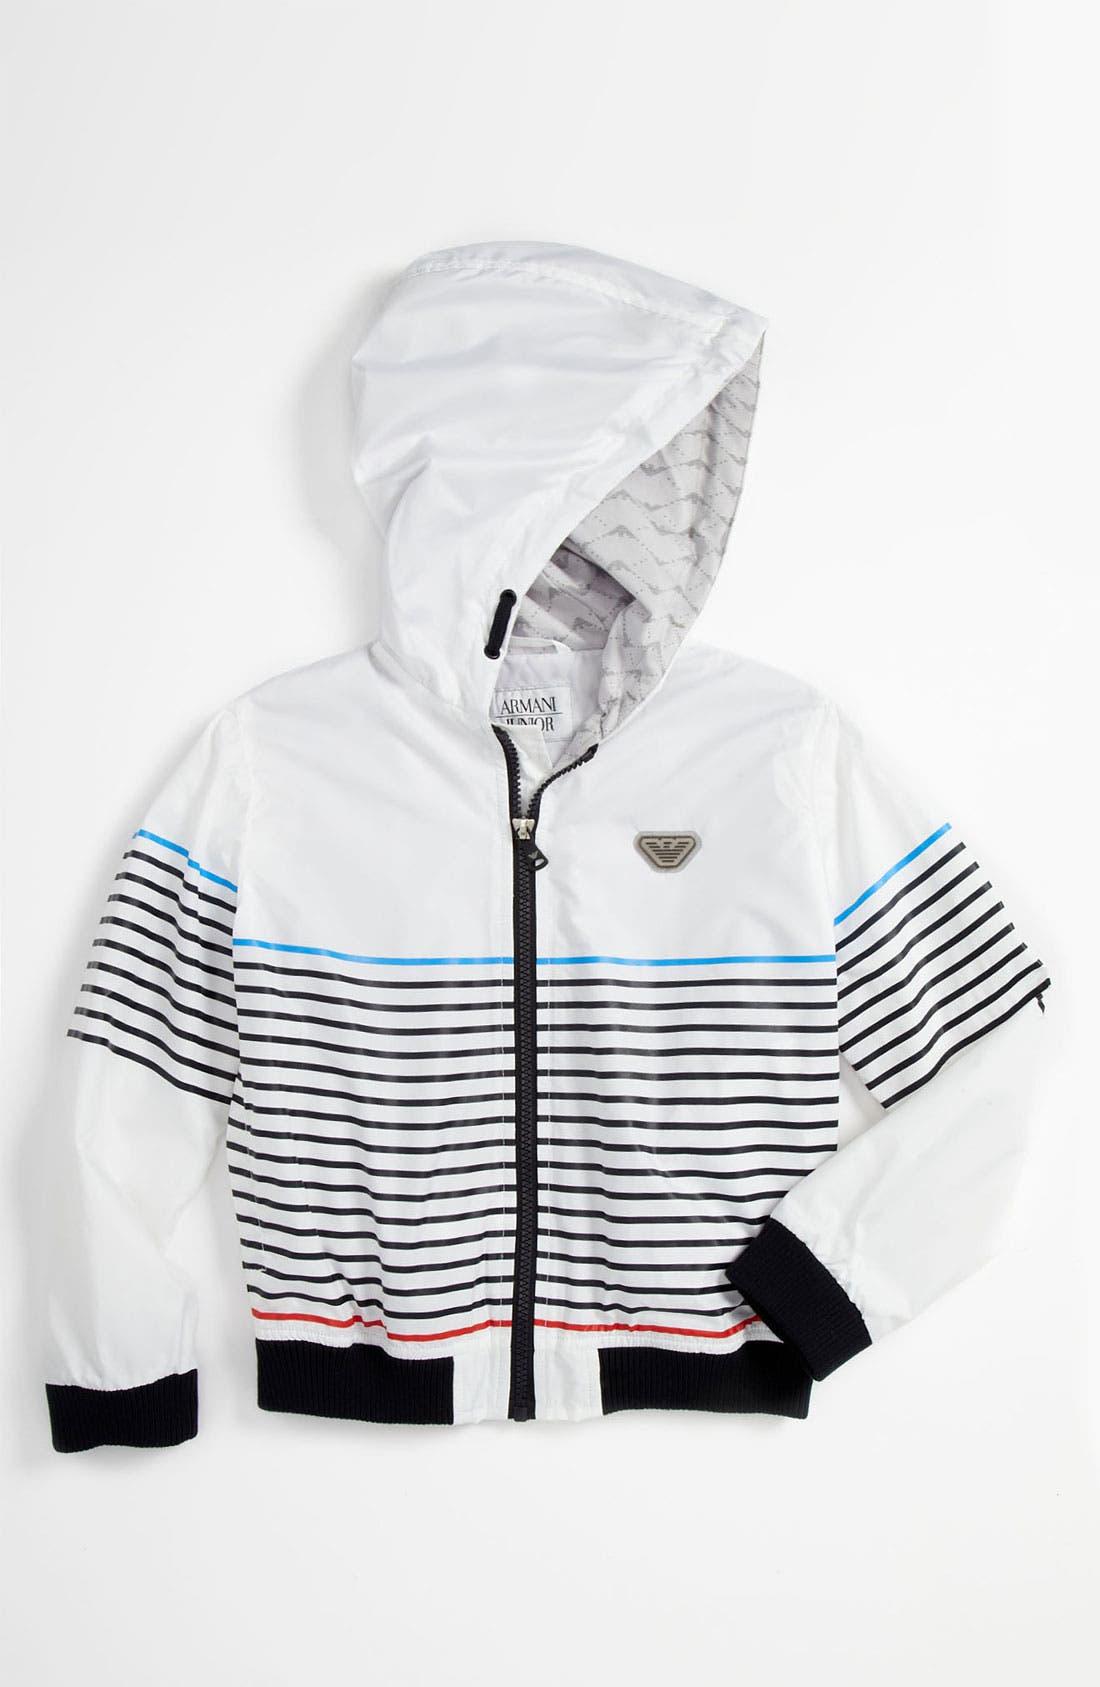 Alternate Image 1 Selected - Armani Junior Stripe Jacket (Toddler & Little Boys)